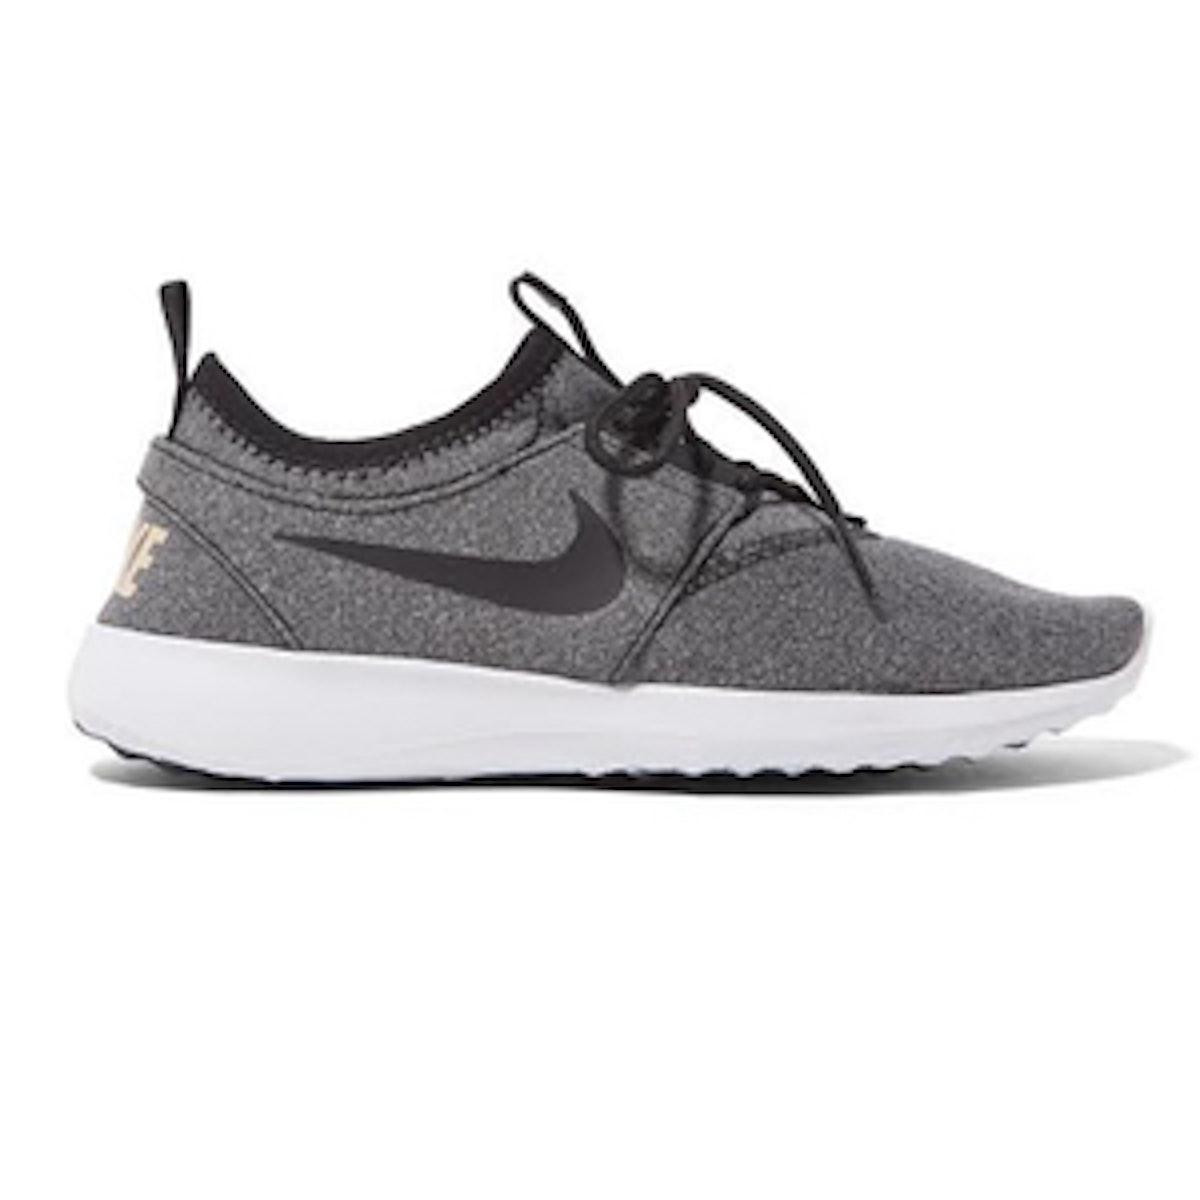 Juvenate Marled Mesh Sneakers